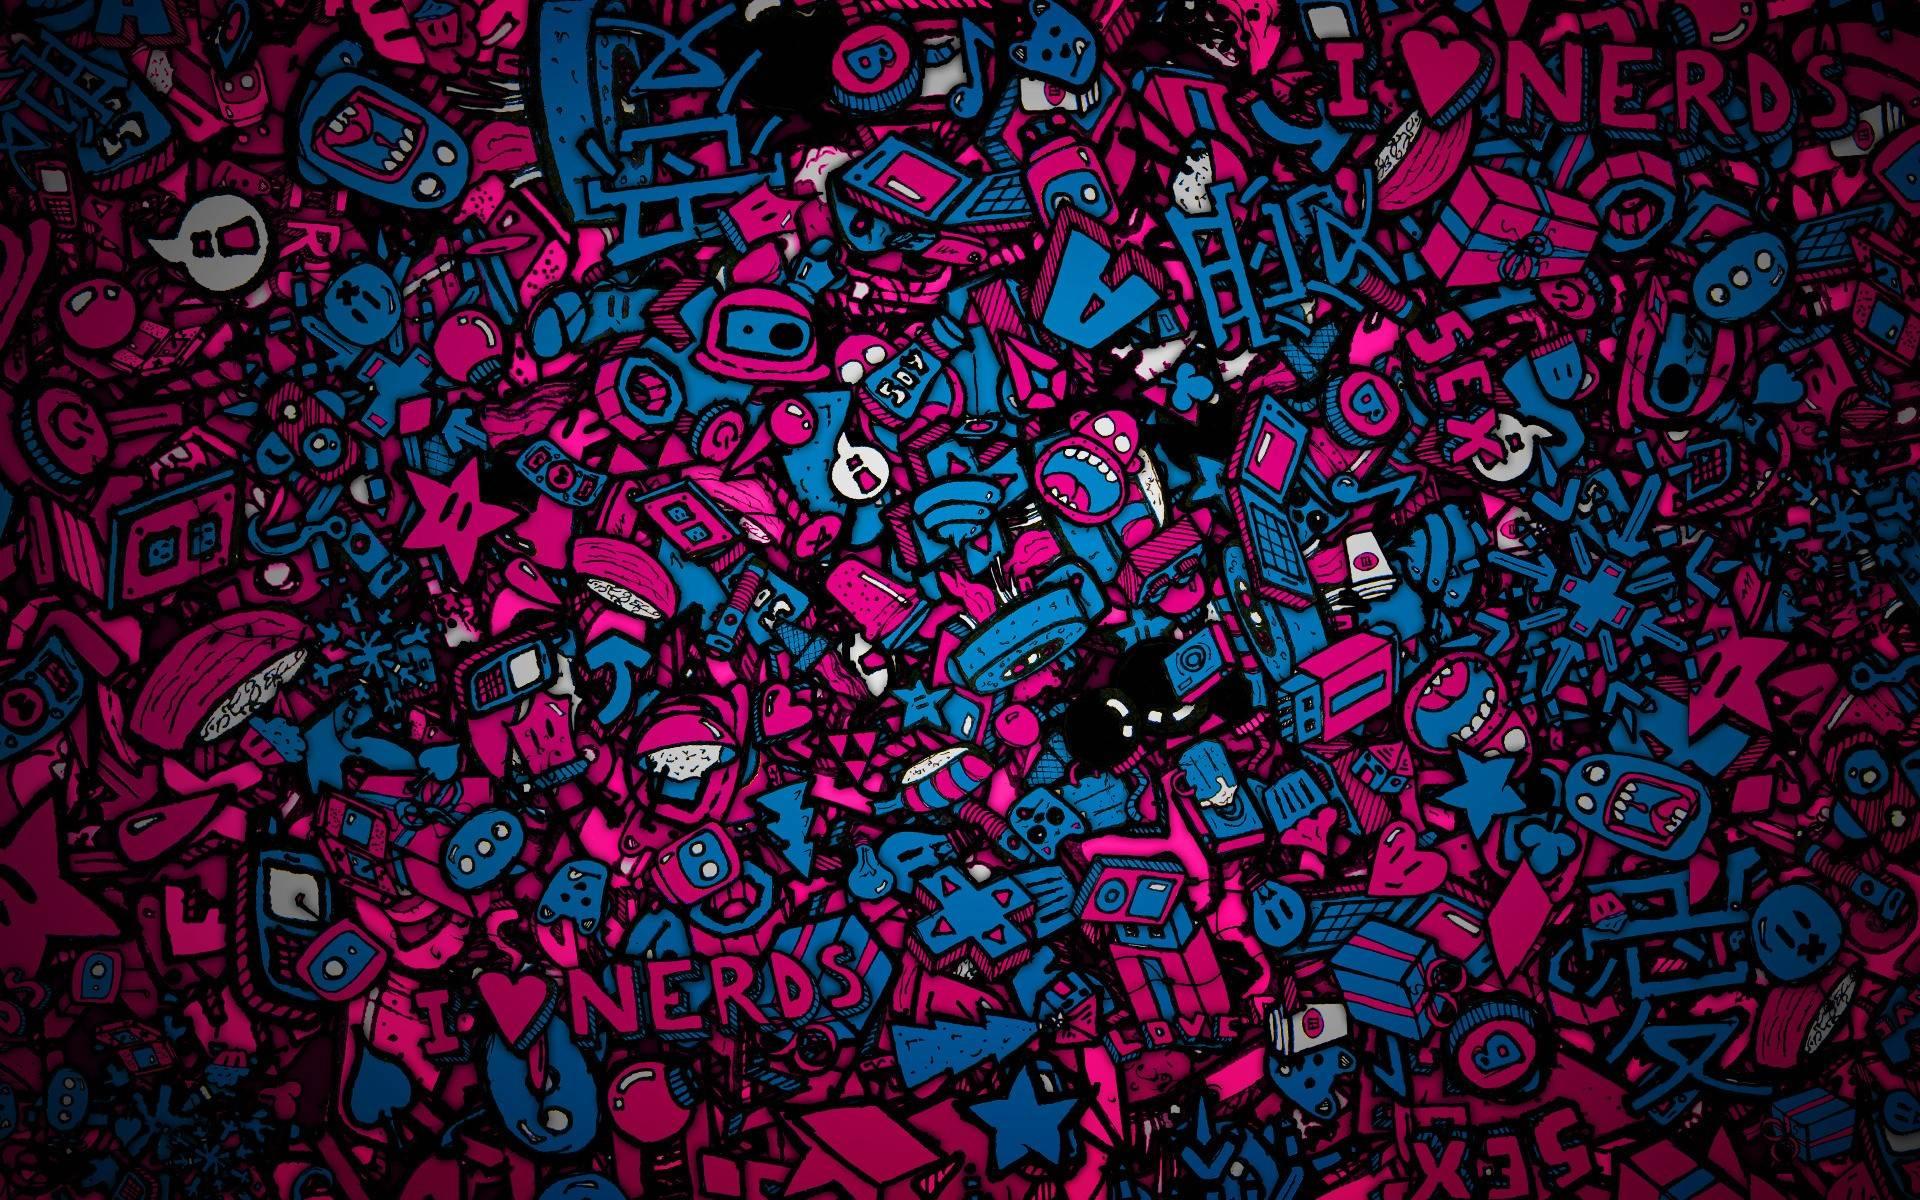 Free Nerd Love Wallpapers HD